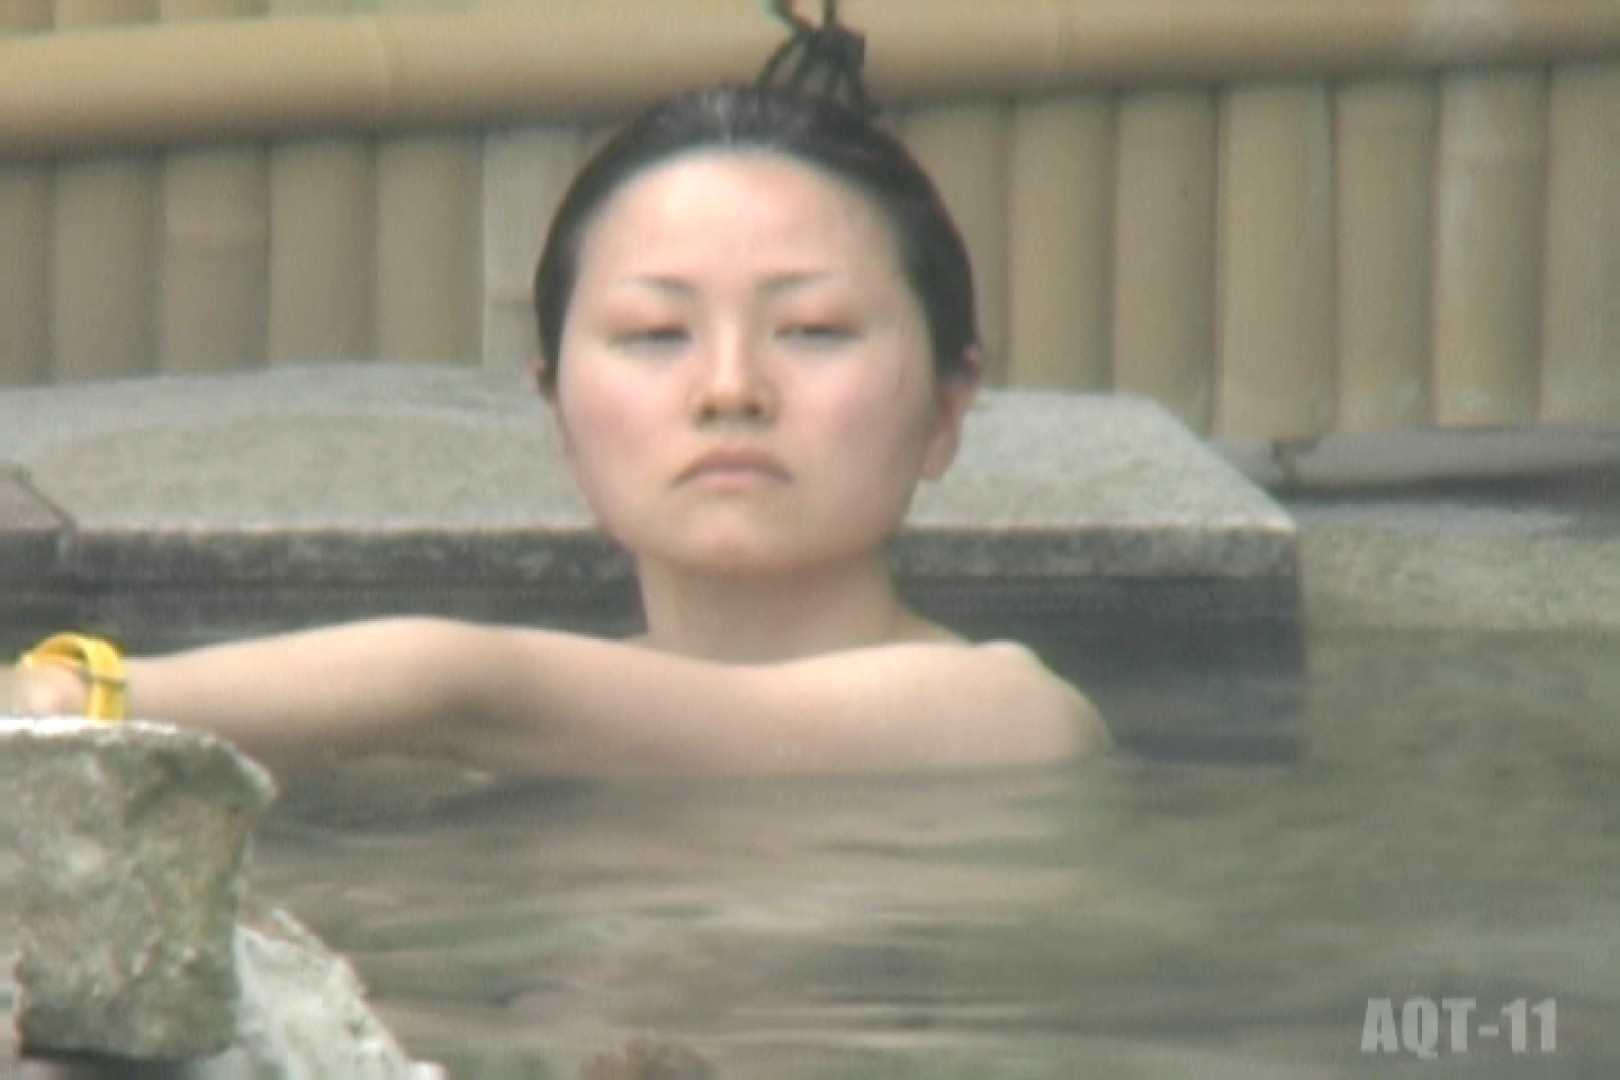 Aquaな露天風呂Vol.802 女体盗撮 盗み撮りSEX無修正画像 85連発 62